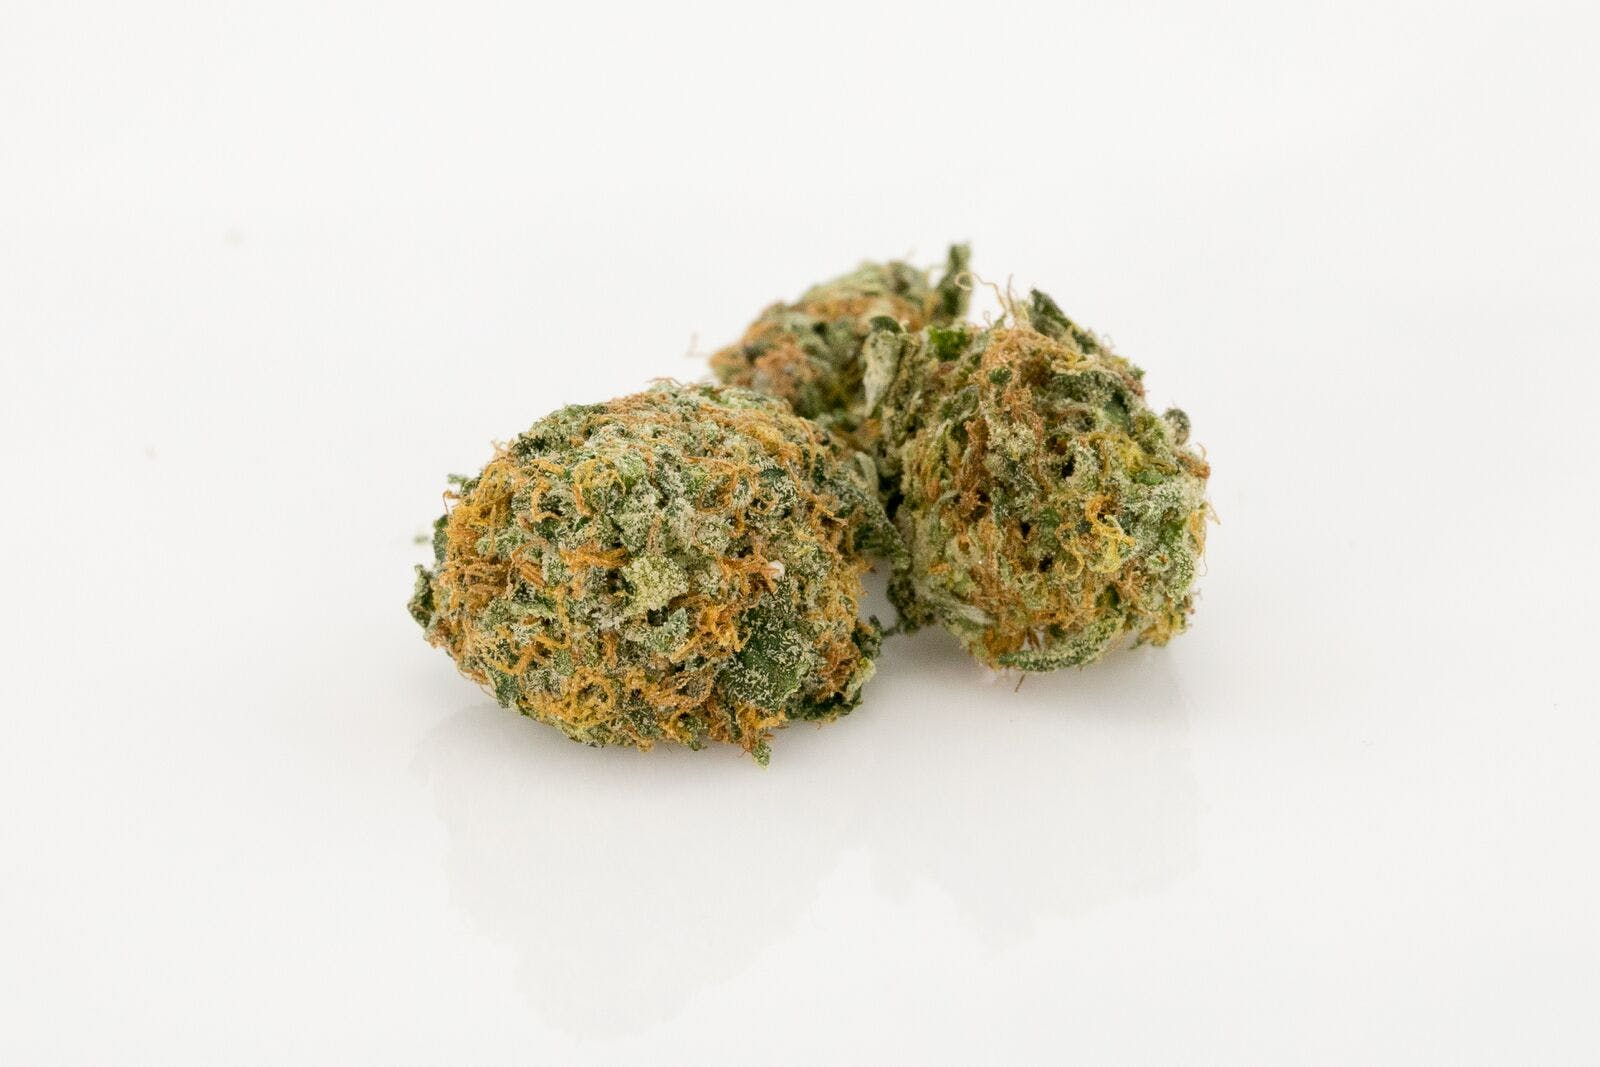 Island Pink Weed; Island Pink Cannabis Strain; Island Pink Indica Marijuana Strain